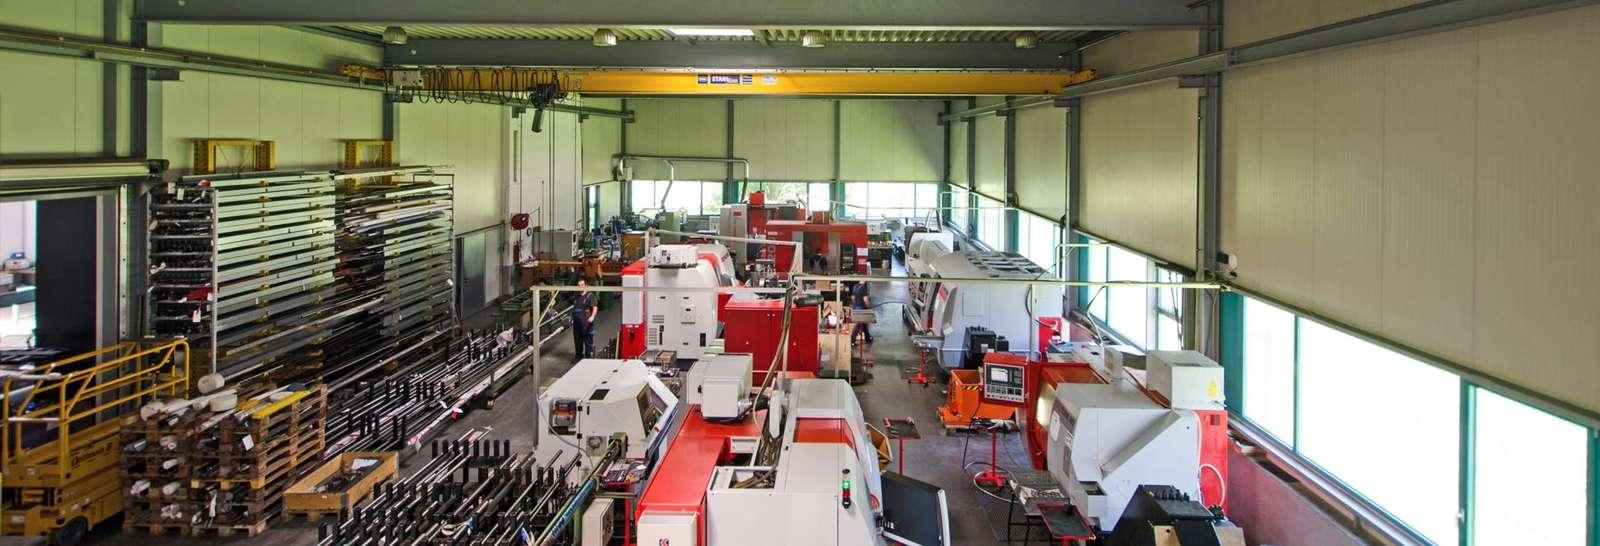 Jenni EMB GmbH